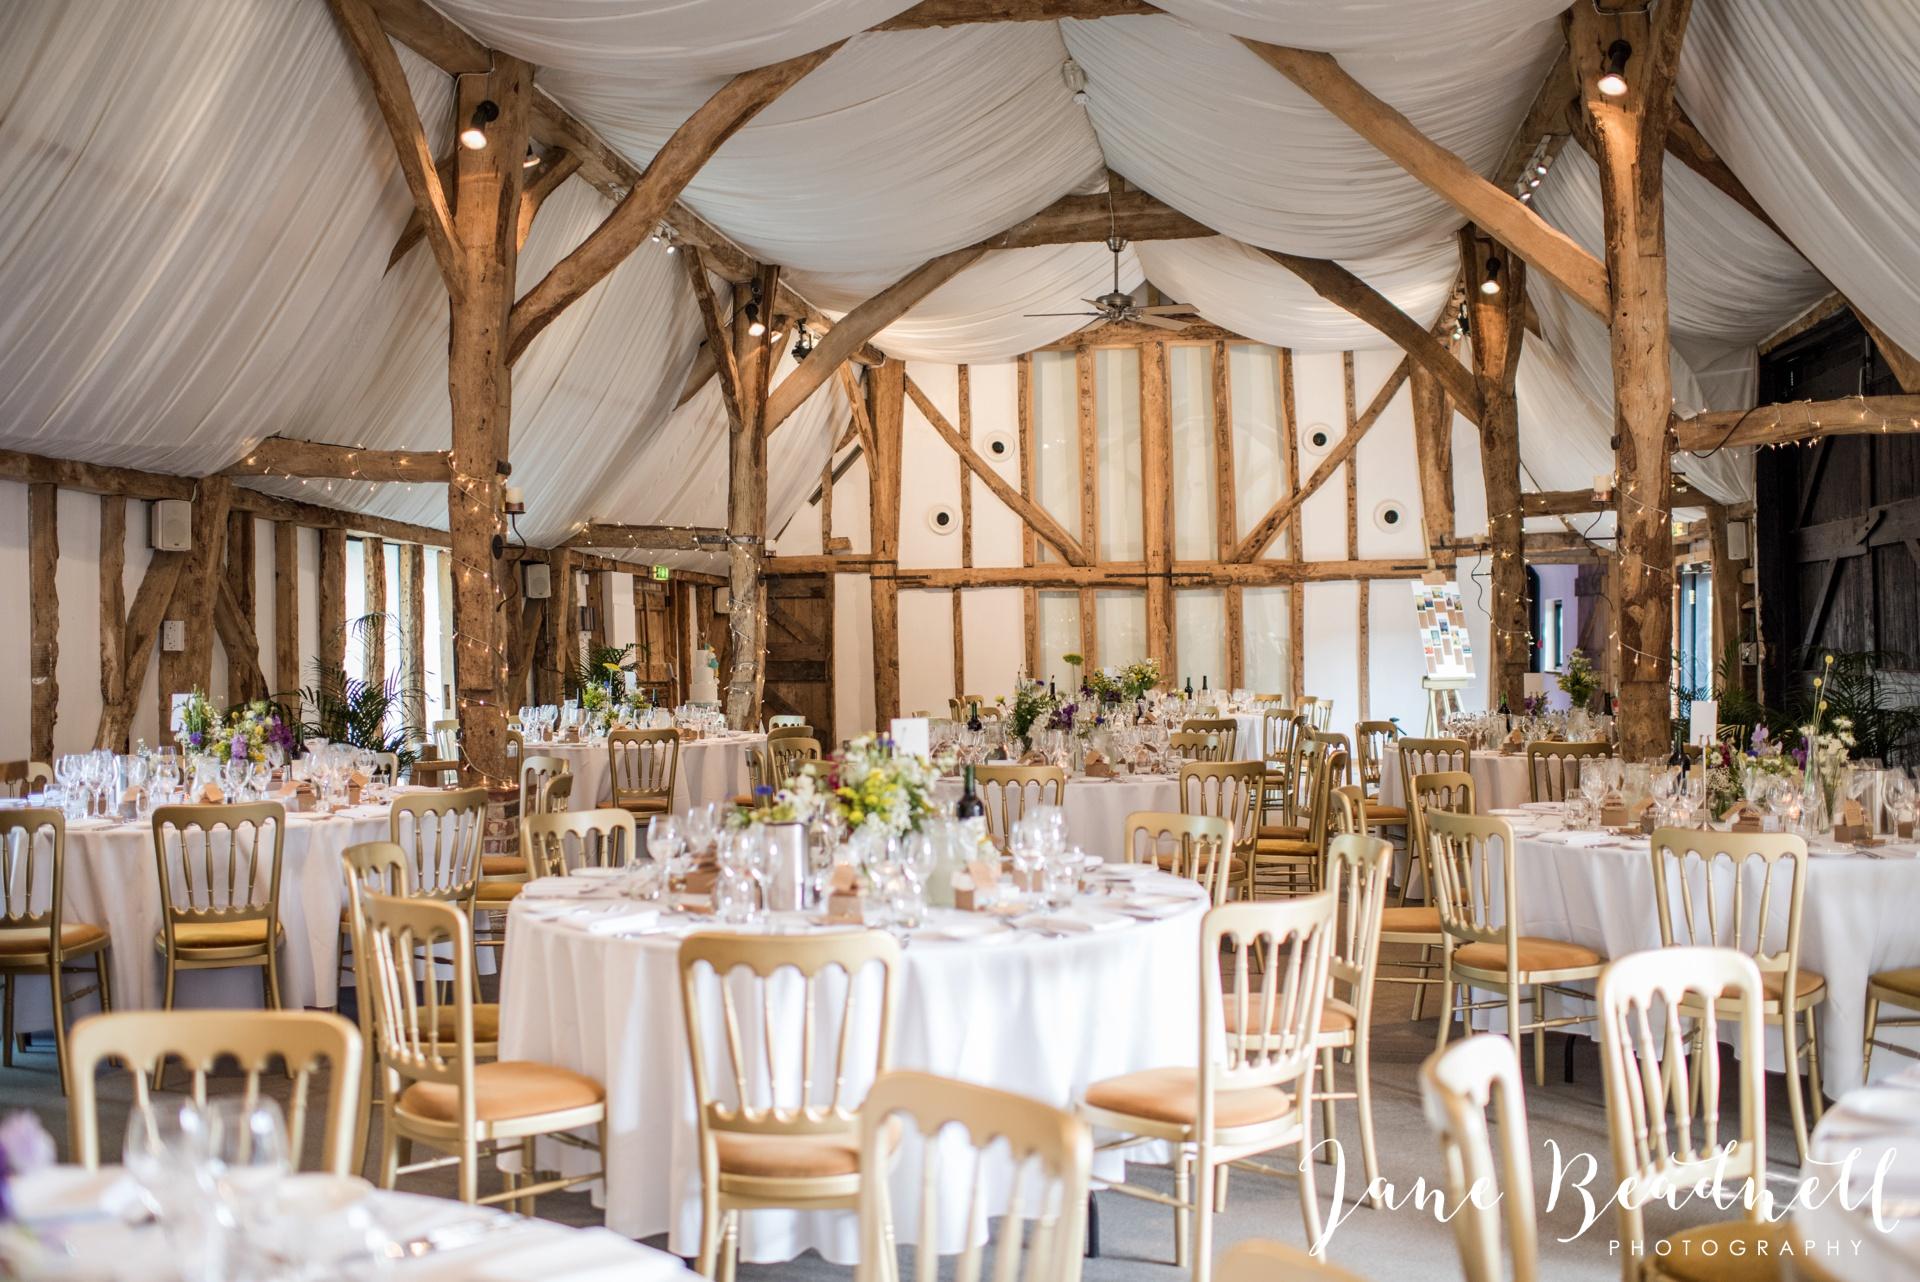 South Farm Wedding photography Hertfordshire by Jane Beadnell Photography fine art wedding photographer_0158